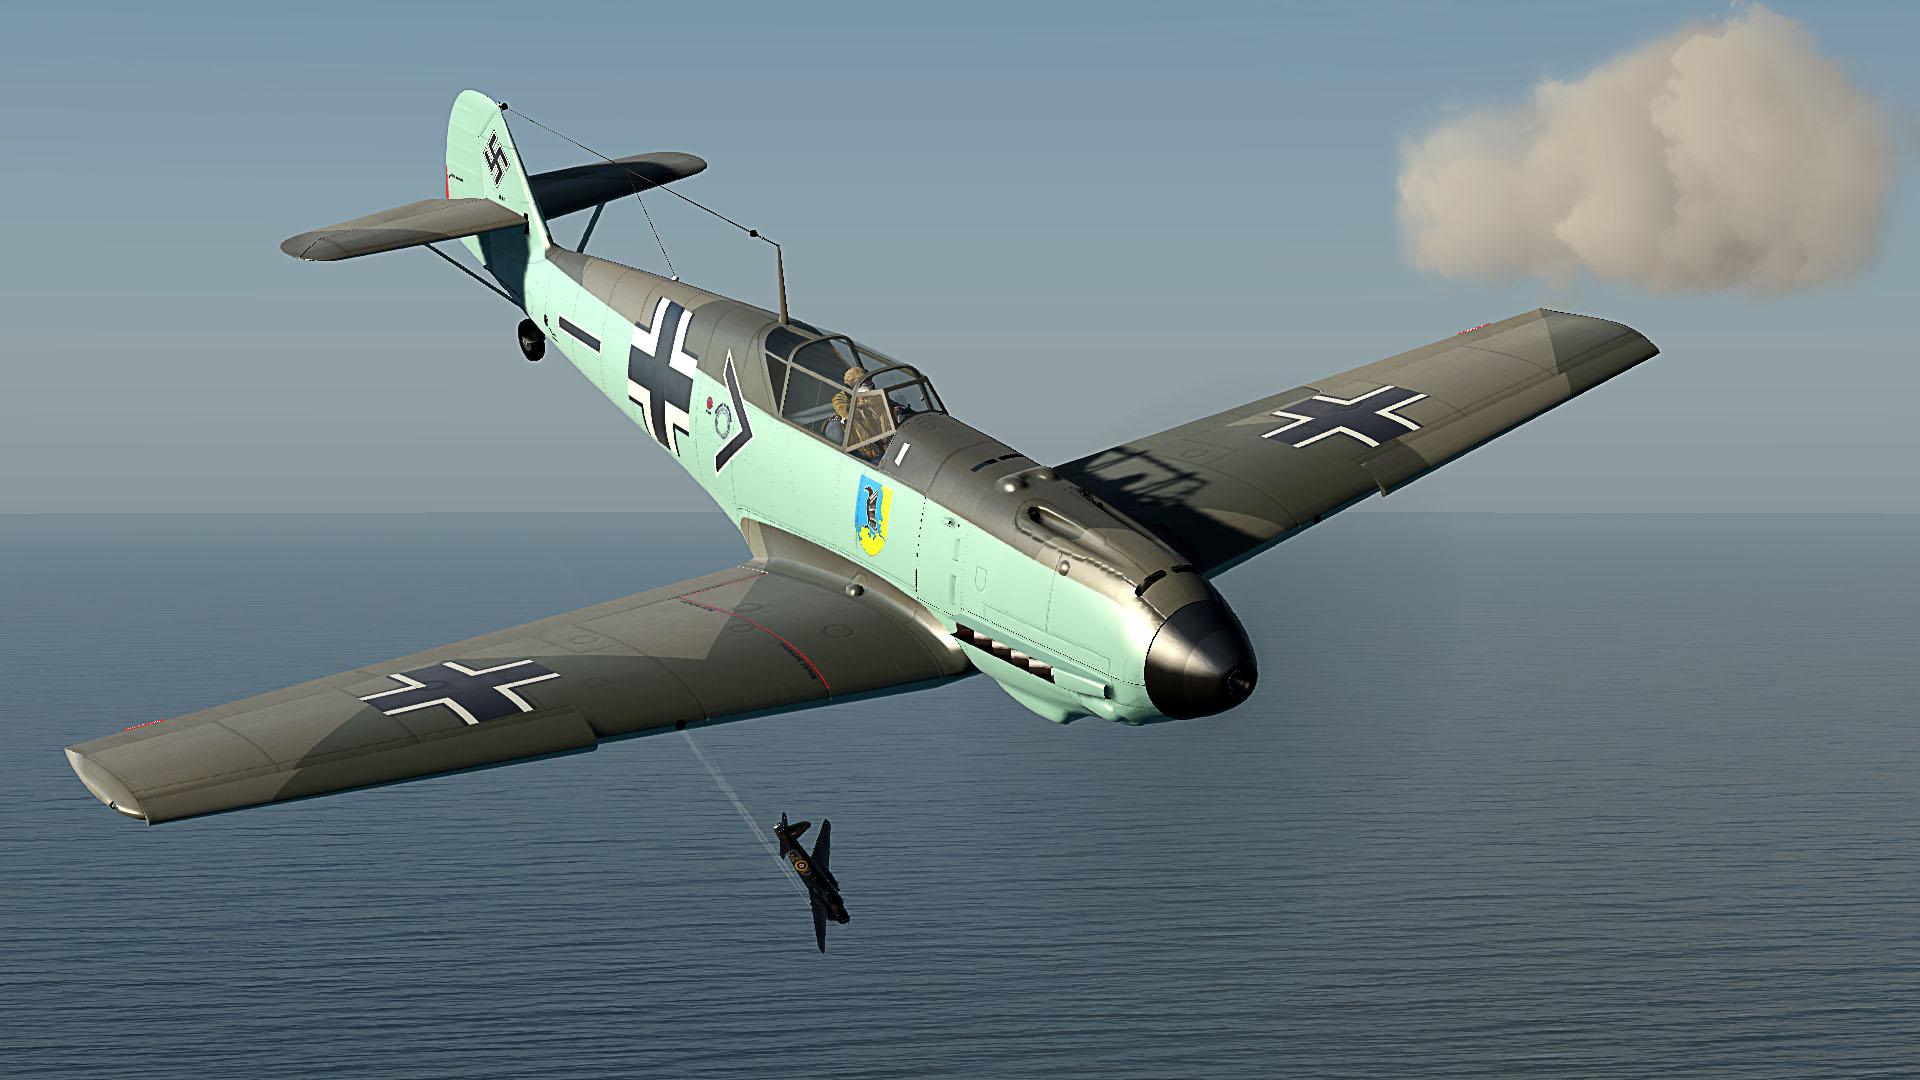 Kommodore Karl Schumacher was credited with a RAF Wellington sd into the Sea 10km N Spiekerooge V01